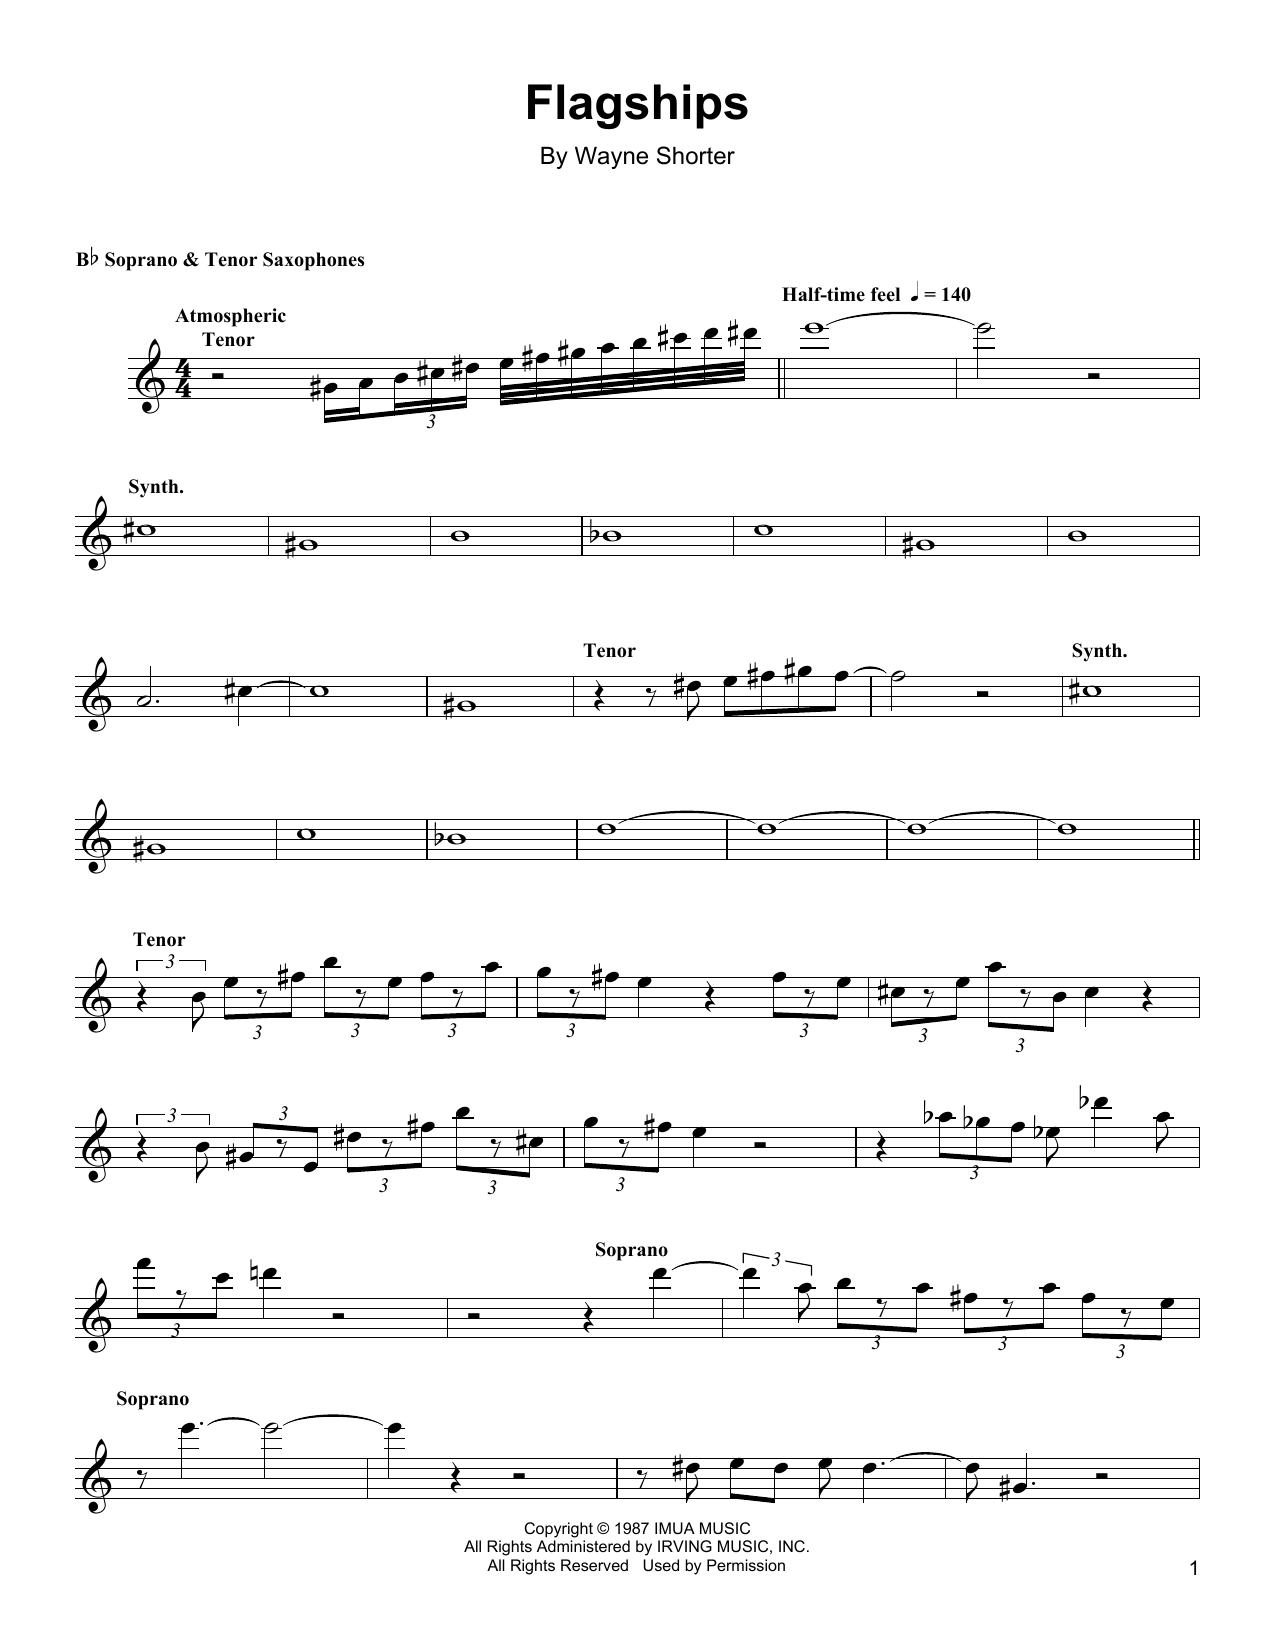 Download Wayne Shorter 'Flagships' Digital Sheet Music Notes & Chords and start playing in minutes